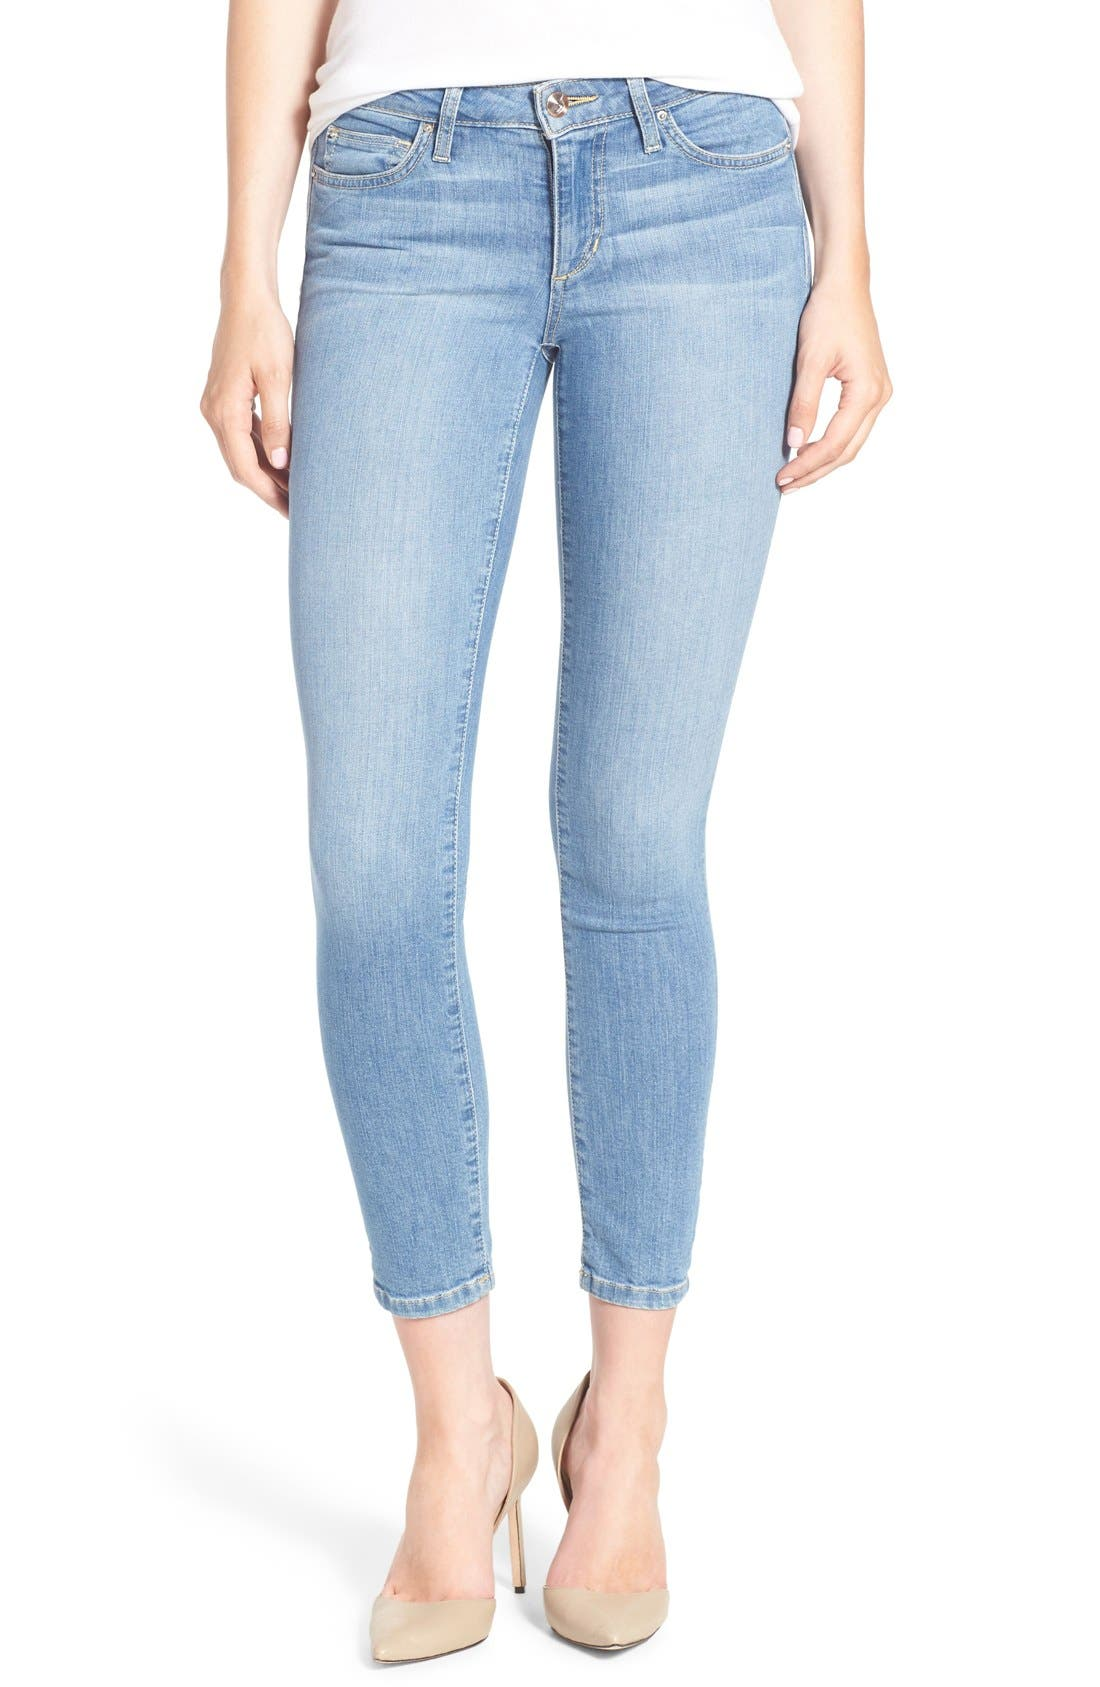 Alternate Image 1 Selected - Joe's 'Vixen' Ankle Skinny Jeans with Phone Pocket (Mitzi)